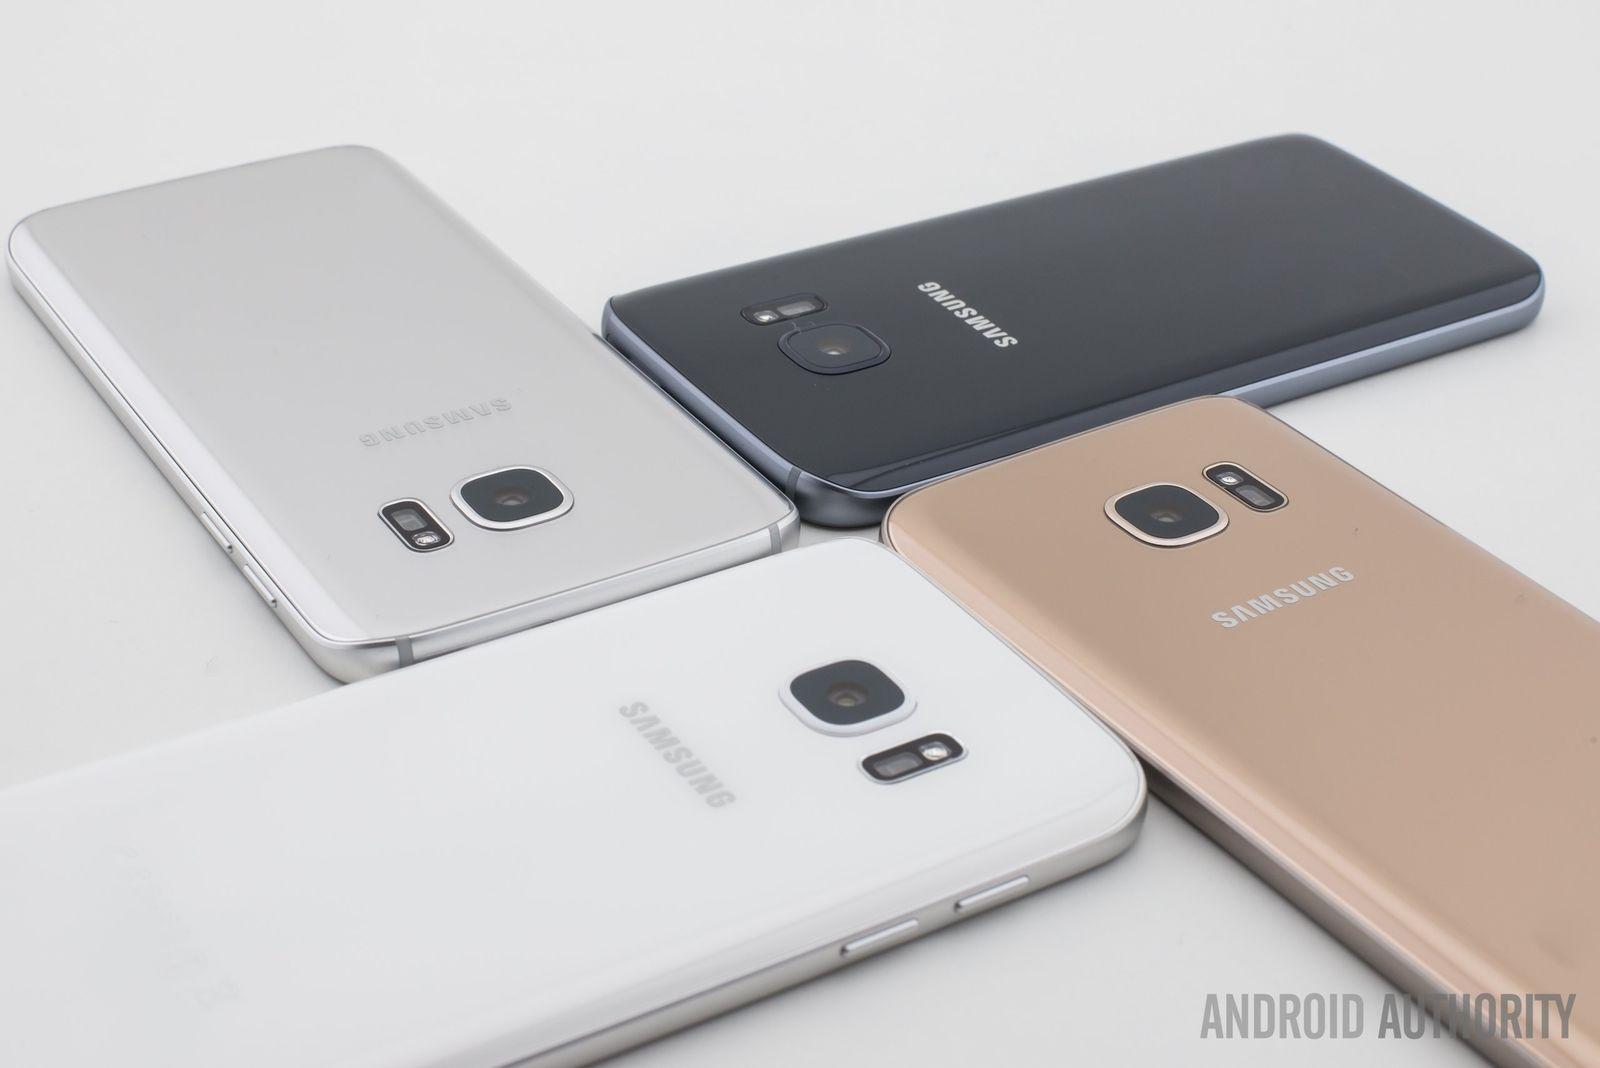 New Sealed Box Samsung Galaxy S7 G930T TMOBILE 32GB 5.1